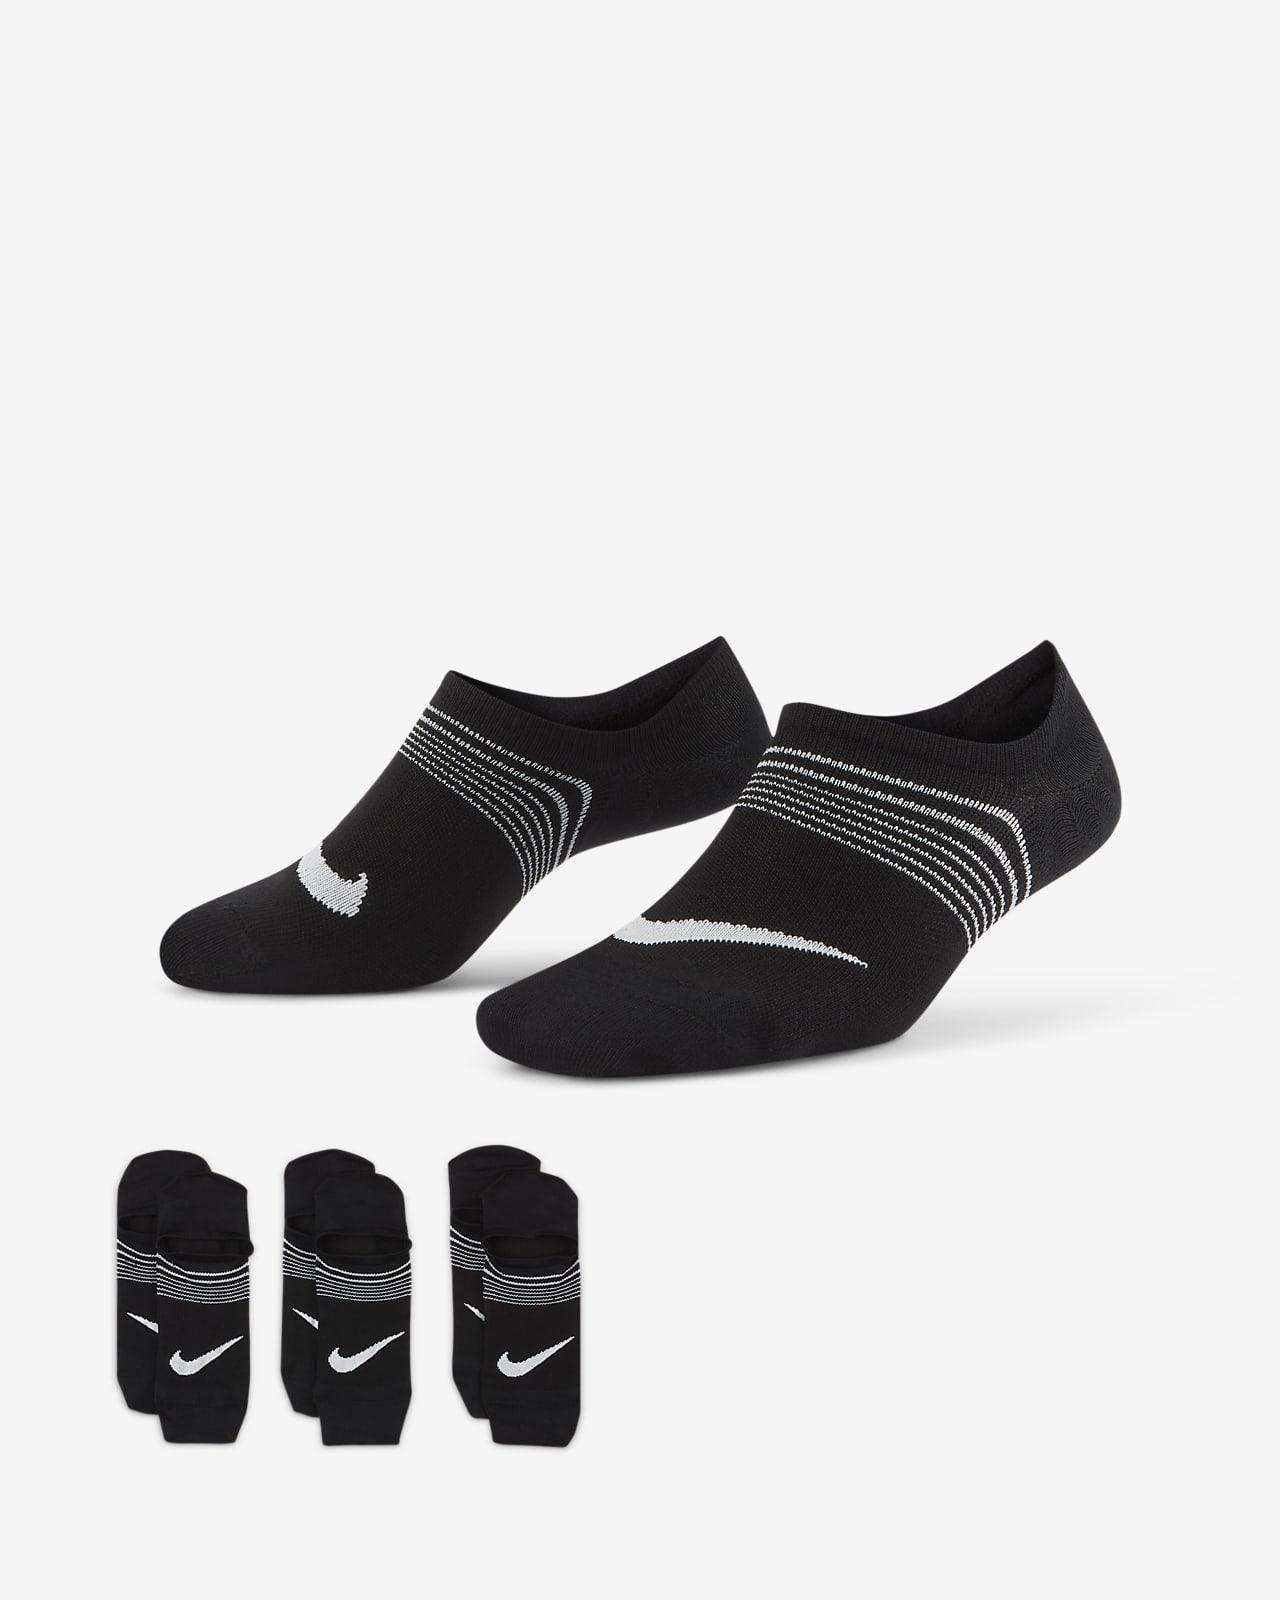 Nike Everyday Plus Lightweight Calcetines de entrenamiento sin puntera (3 pares) - Mujer